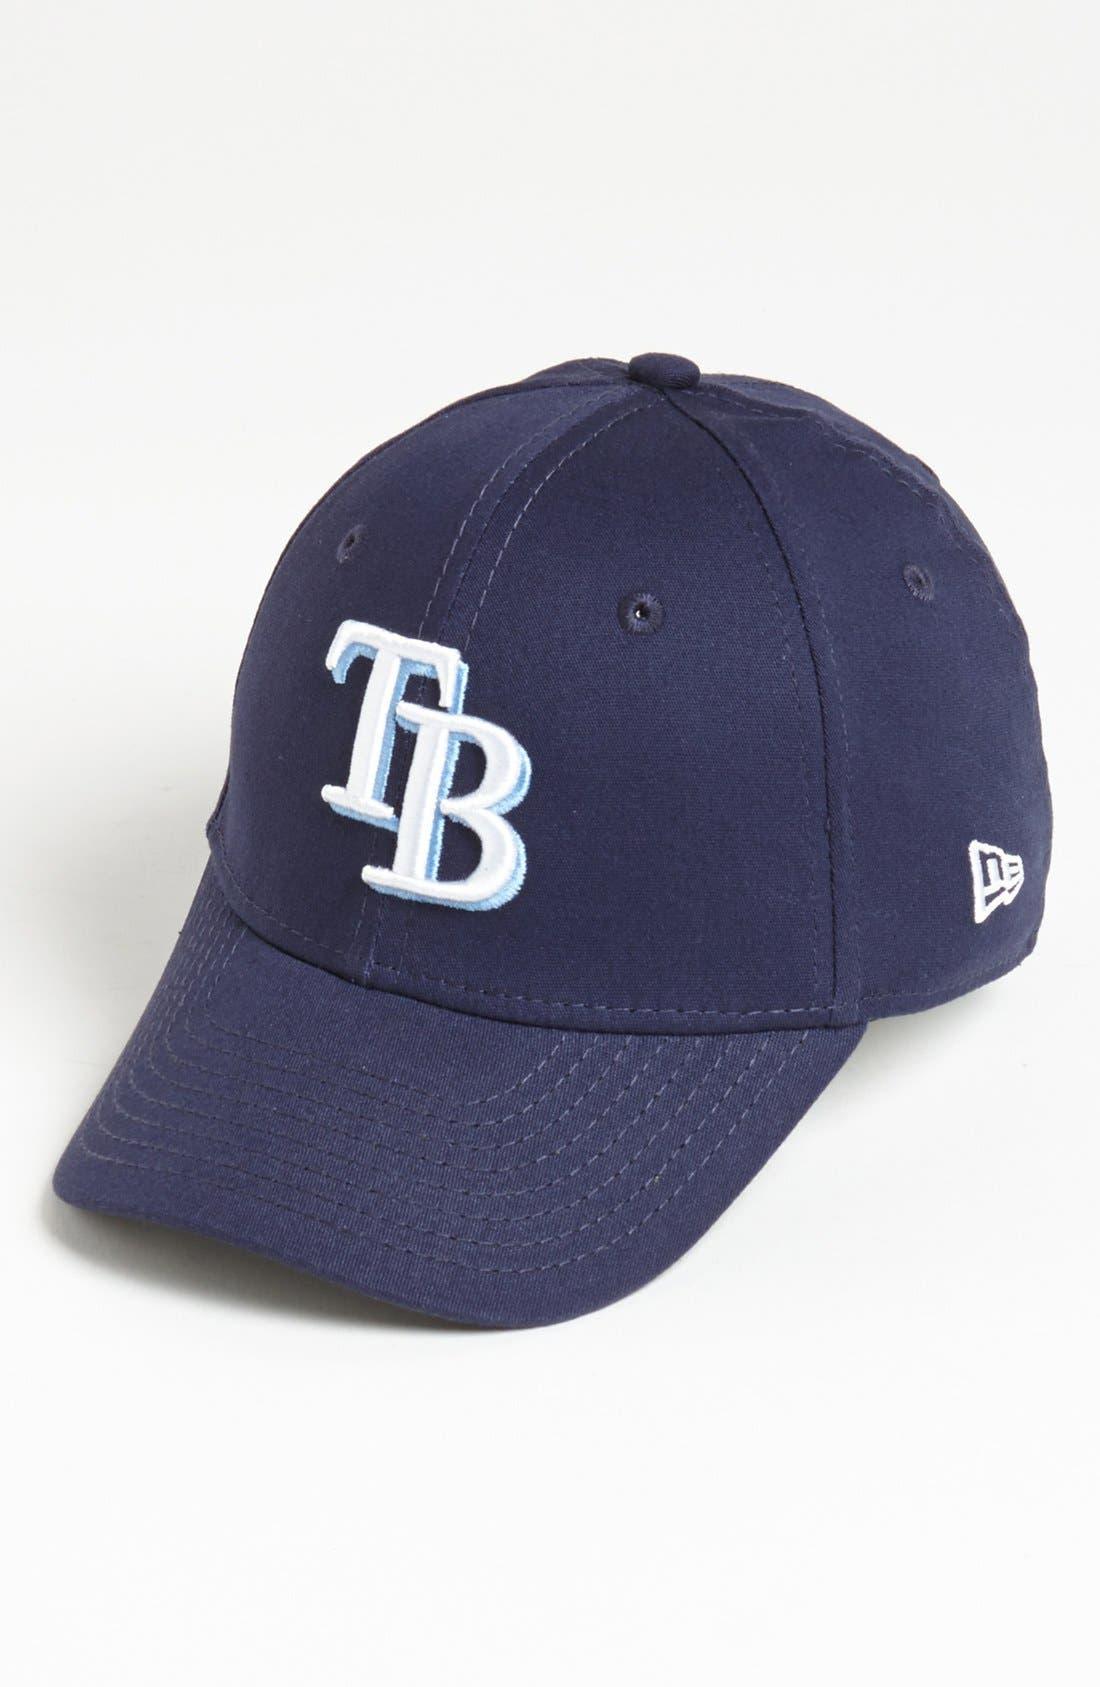 Main Image - New Era Cap 'Tampa Bay Rays - Tie Breaker' Baseball Cap (Big Boys)